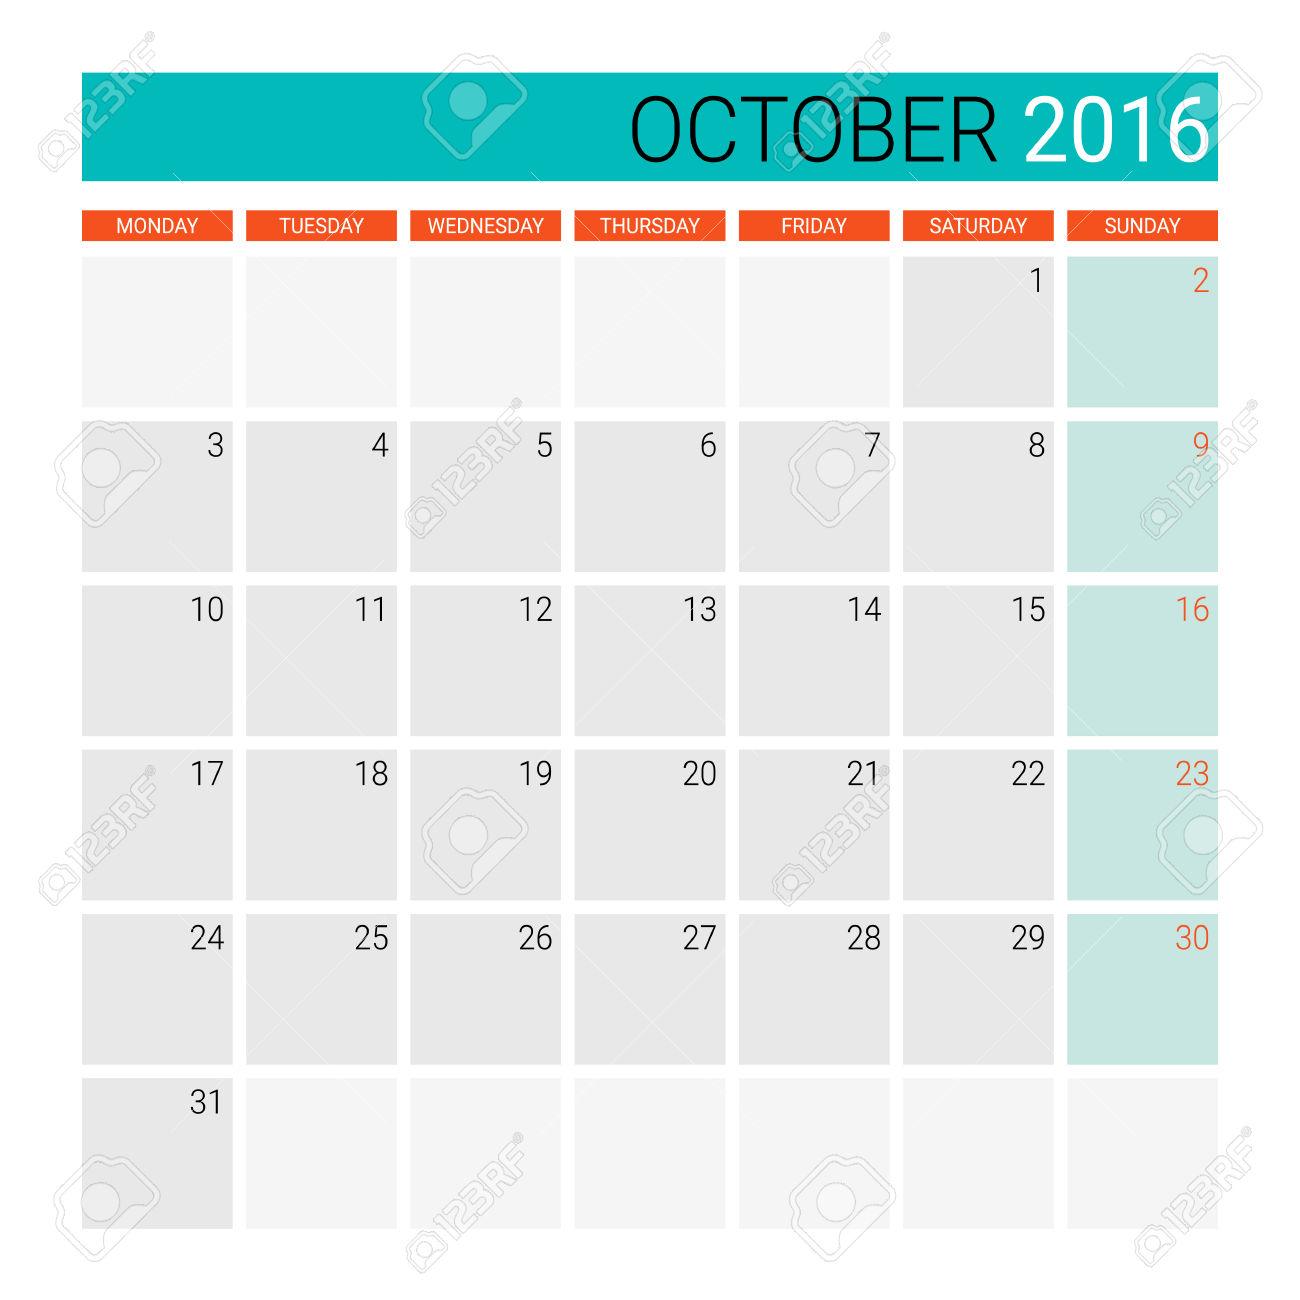 Calendar october 2016 clipart svg transparent library Planner calendar clipart - ClipartFest svg transparent library